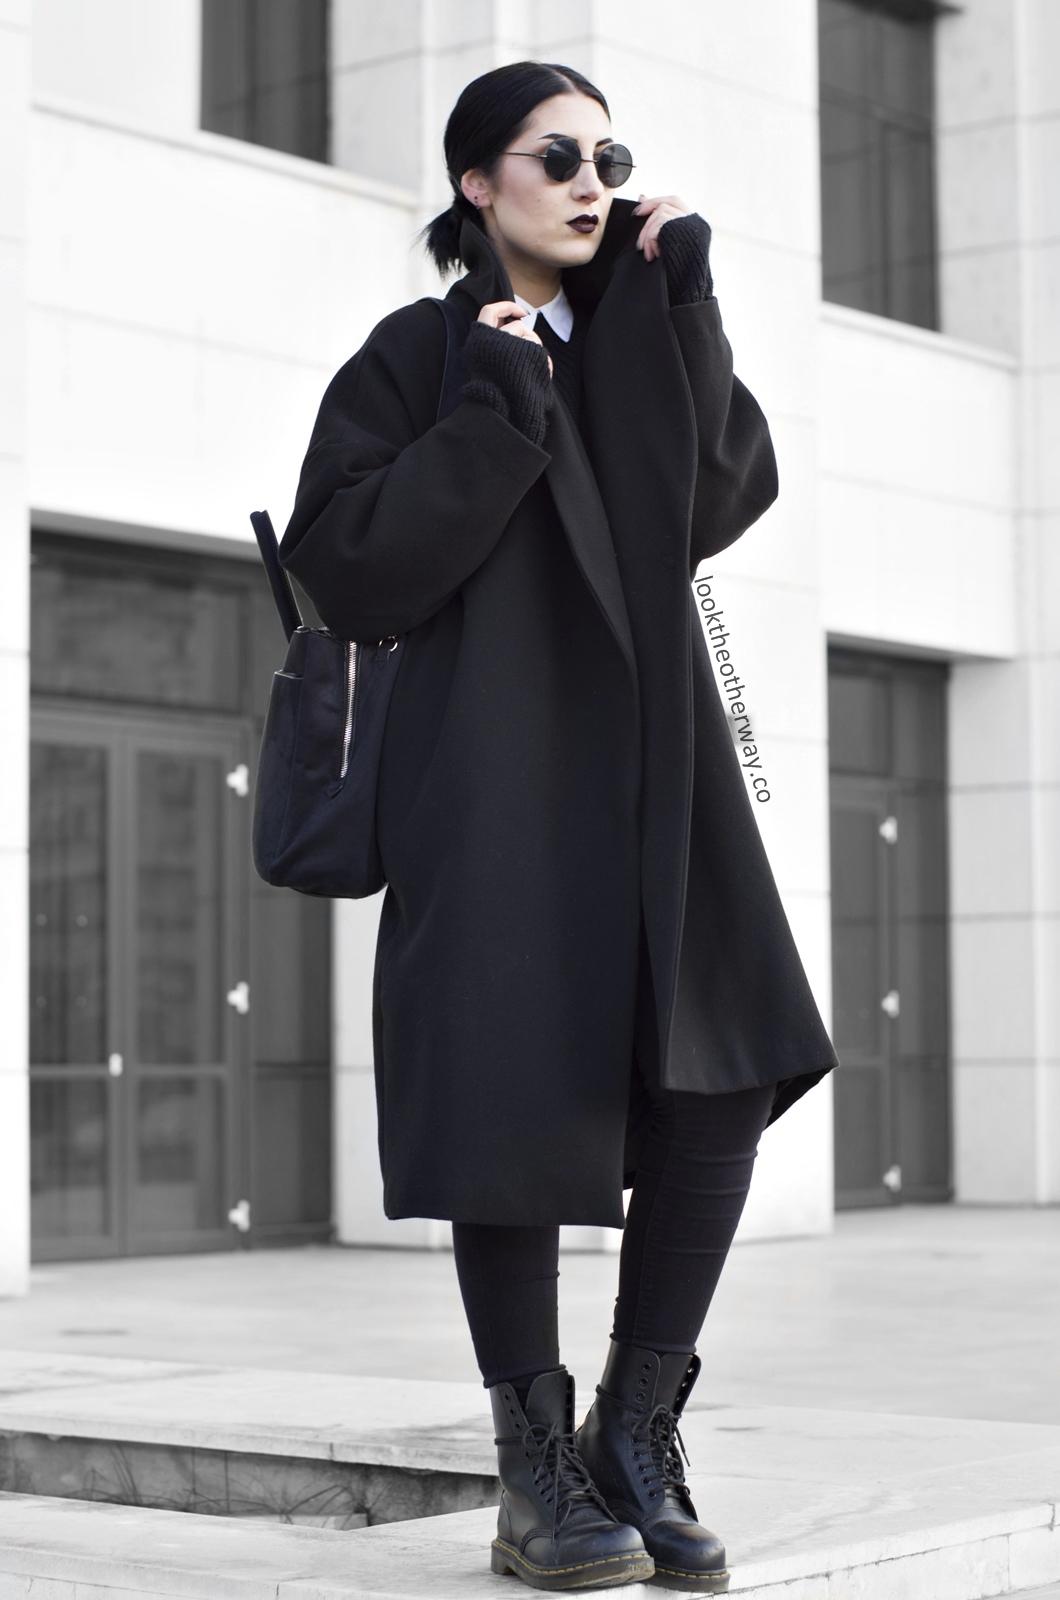 Coat it get any colder?